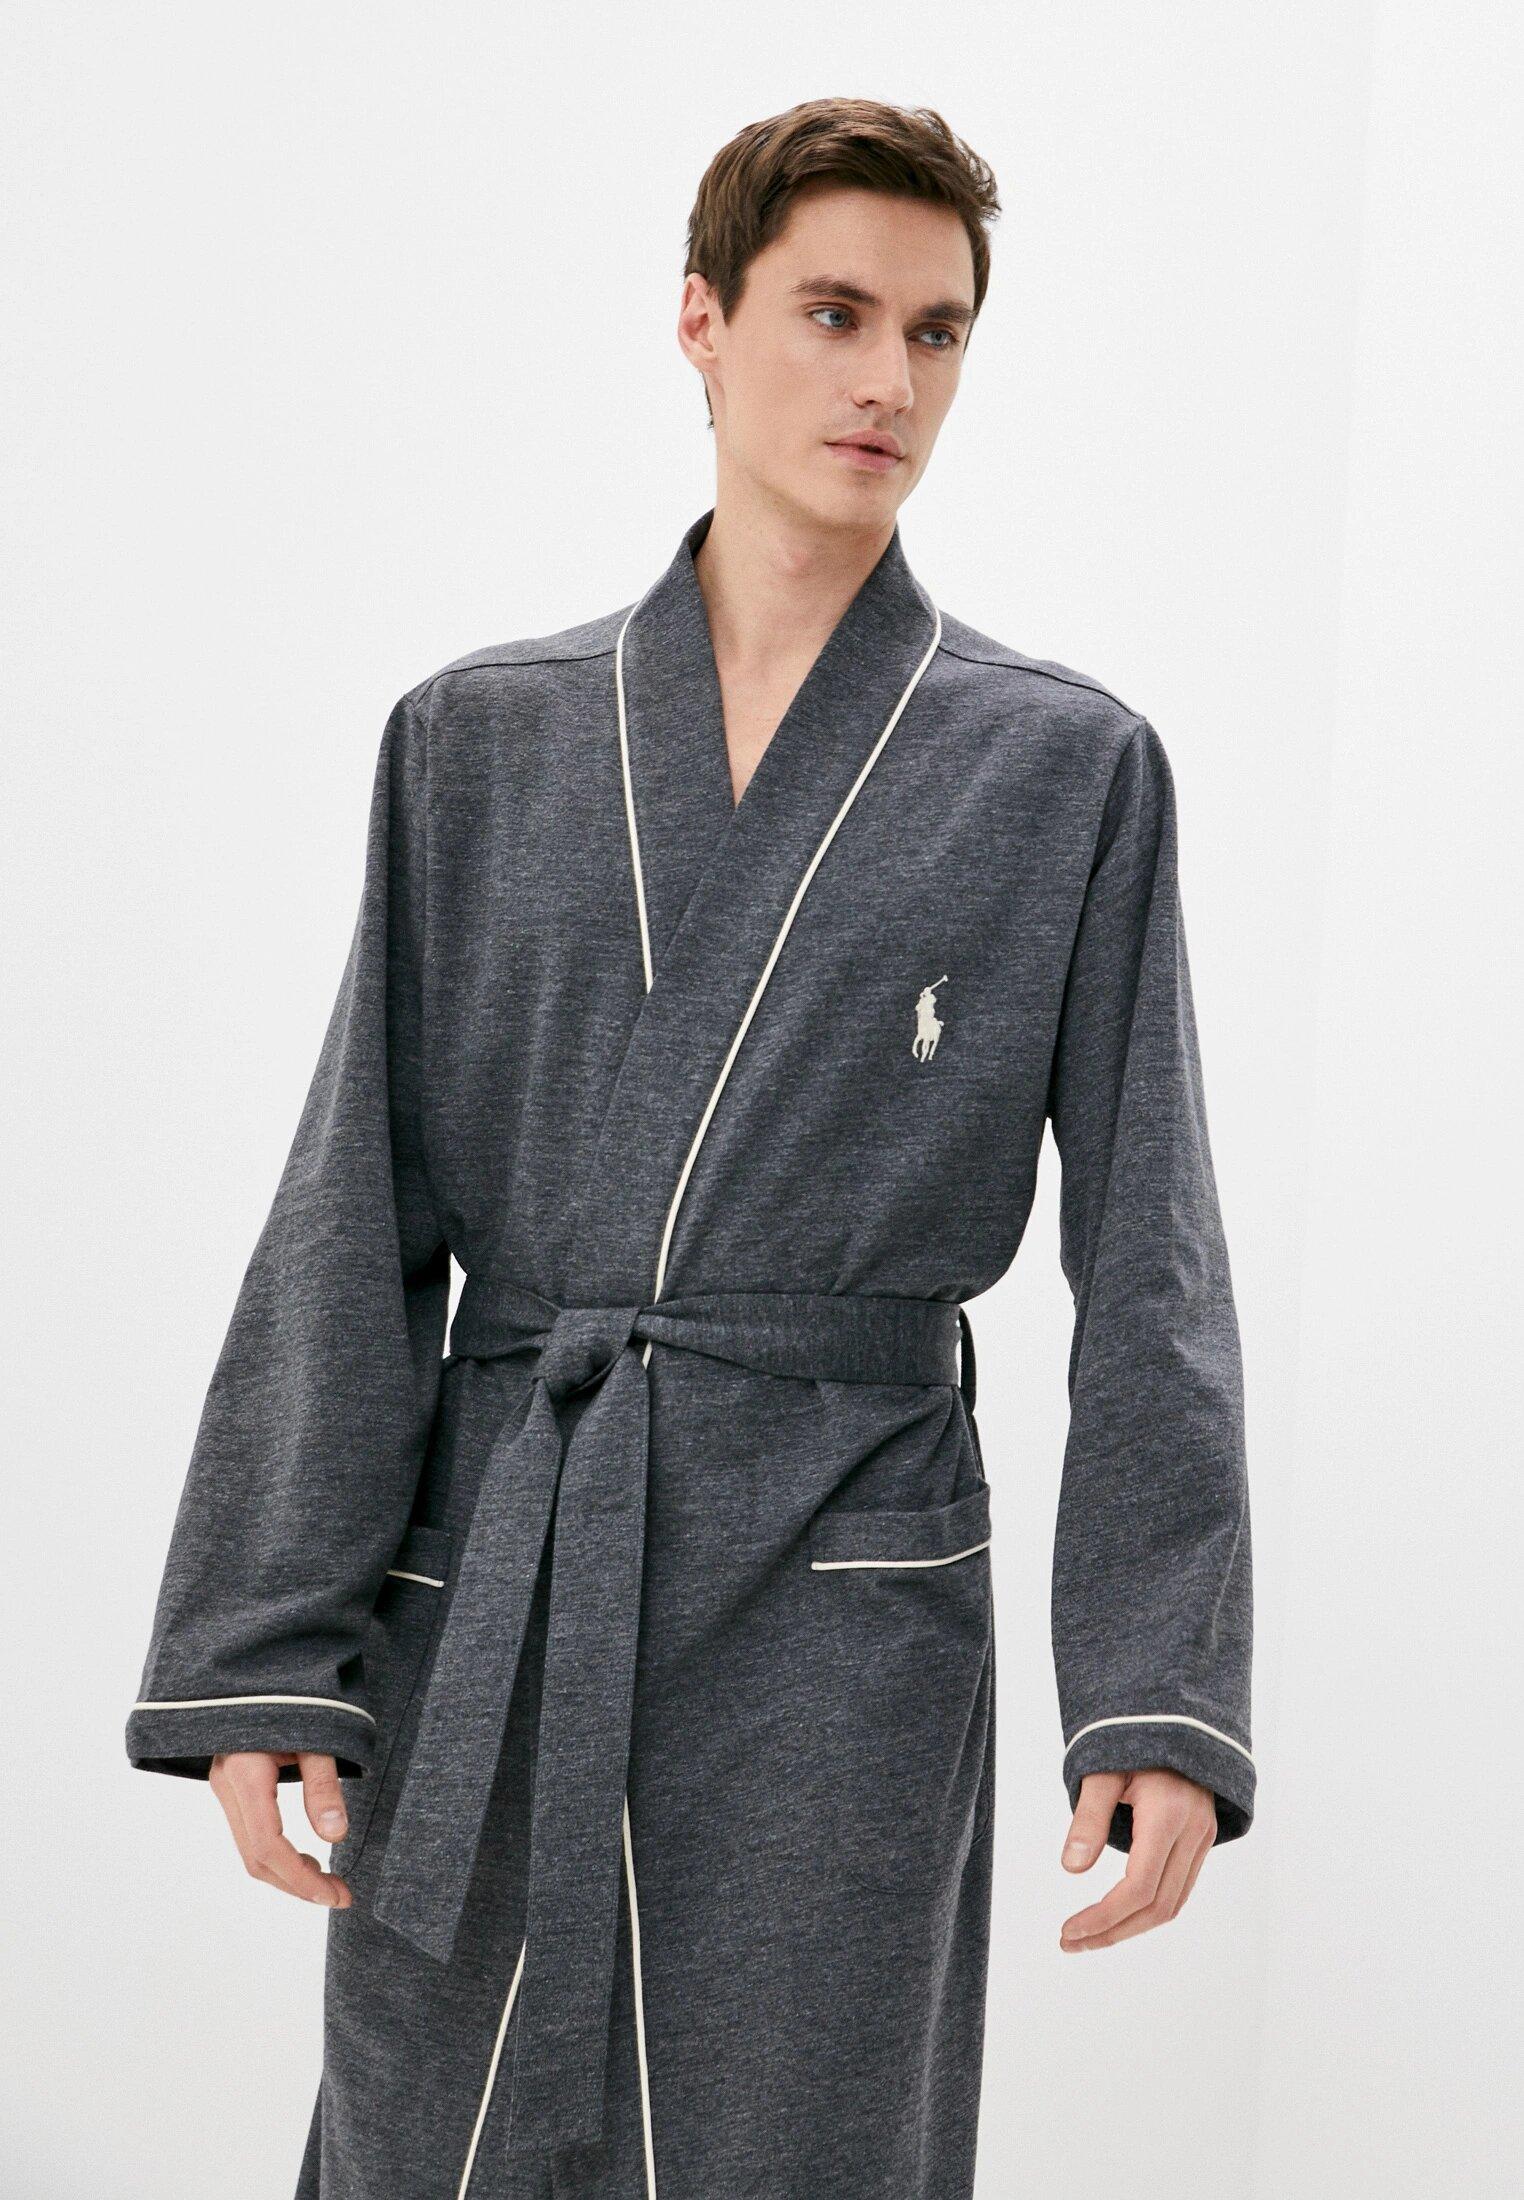 Polo Ralph Lauren 15 550 .